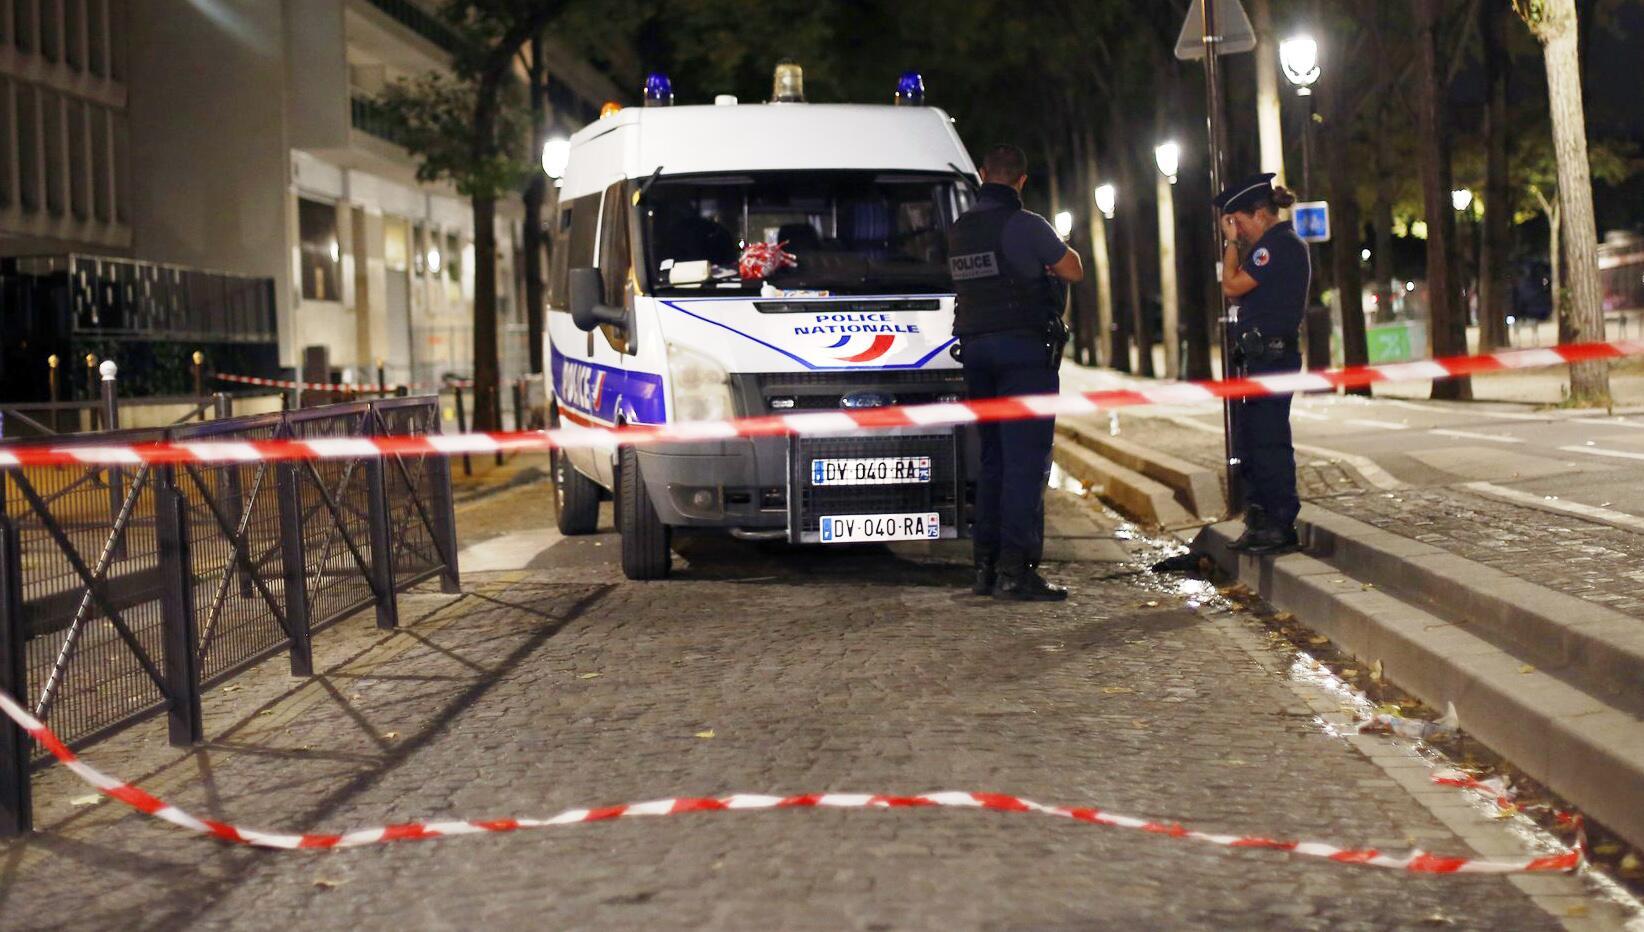 Bild zu Messerattacke in Paris